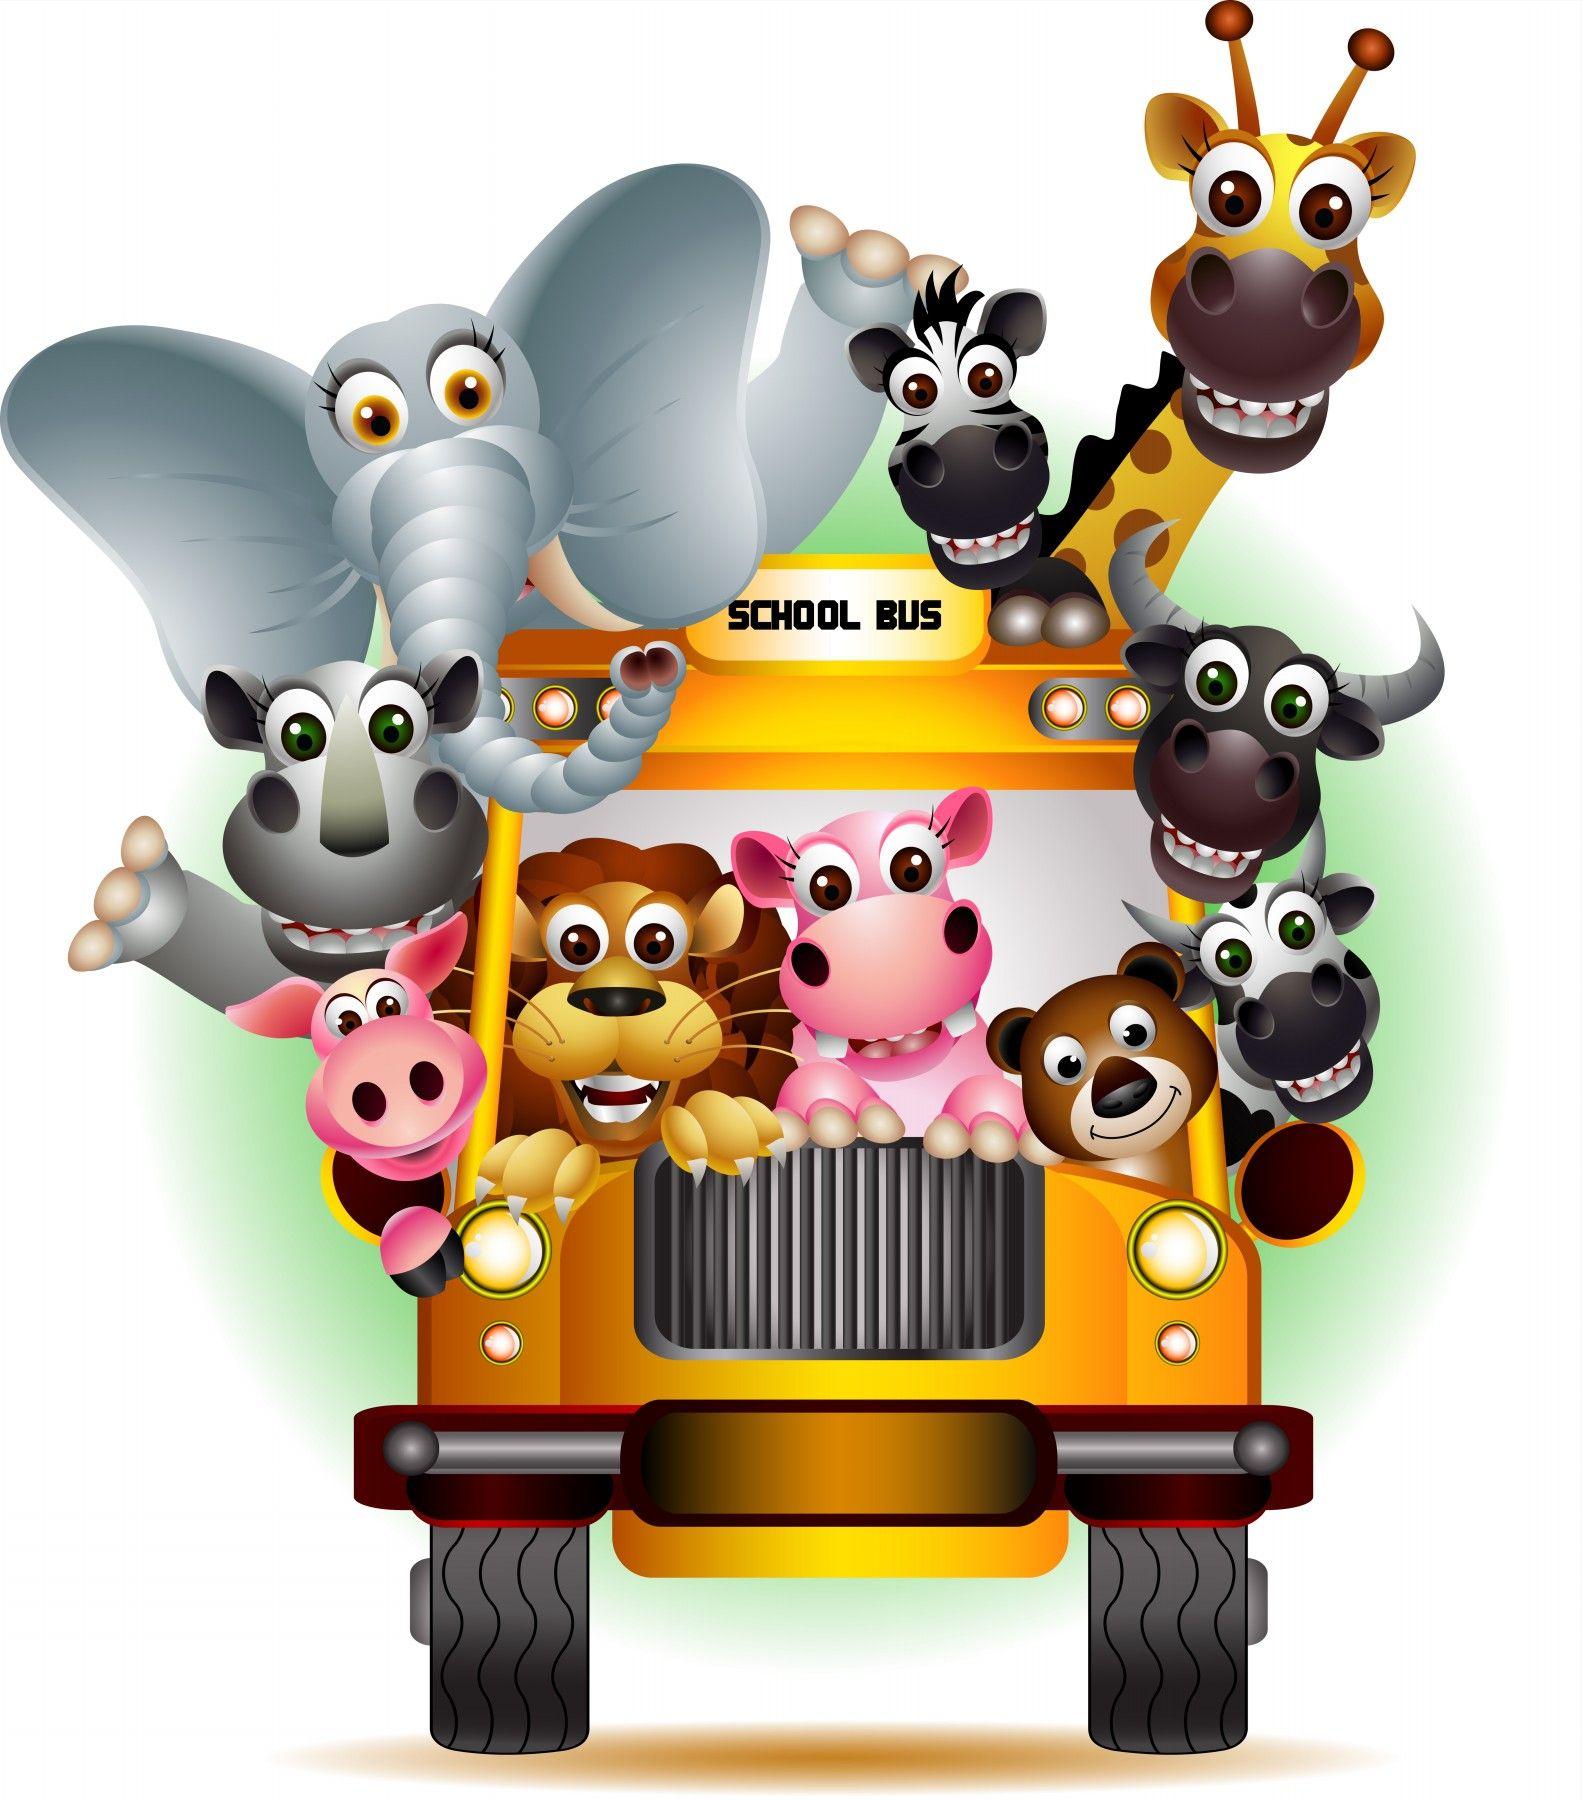 September 1 Back To School Bus Amazing Photos Yellow School Bus Funny Animals School Bus